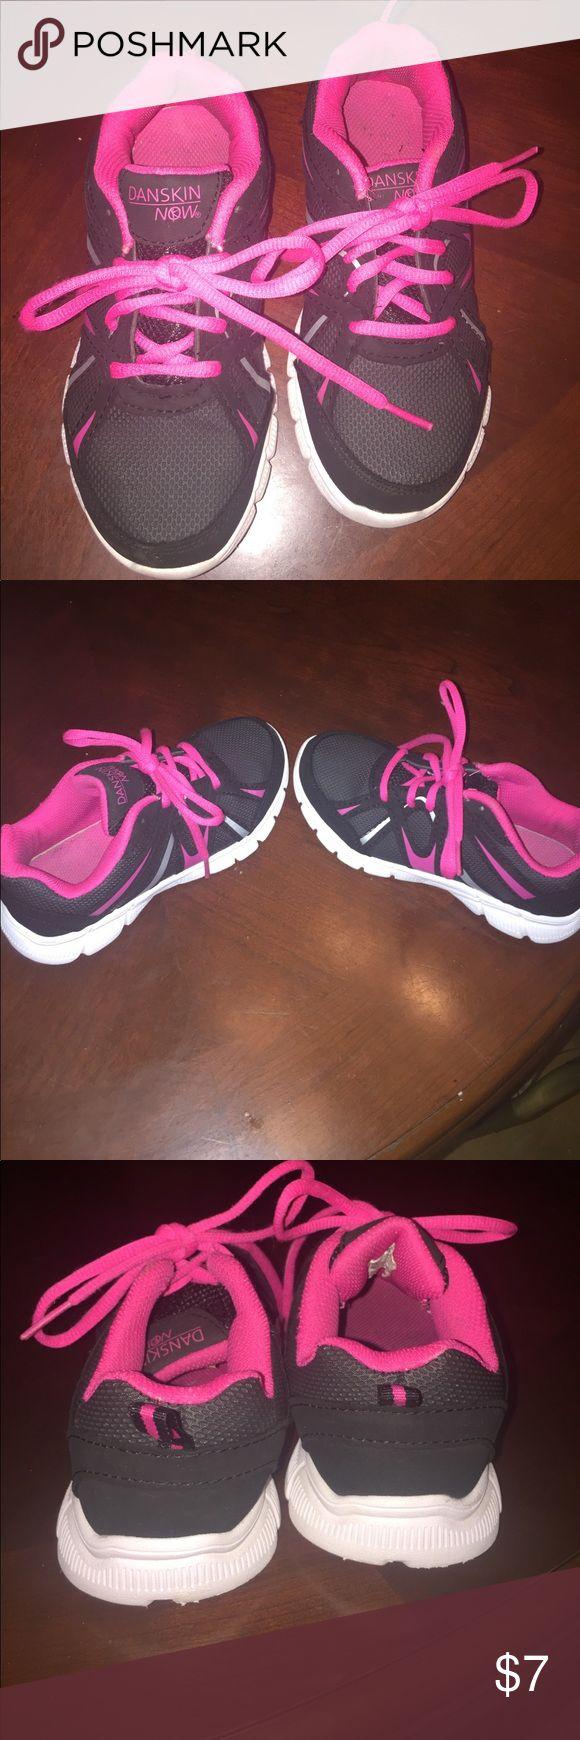 Girls Tennis Shoes Danskin Now walmart Shoes Sneakers